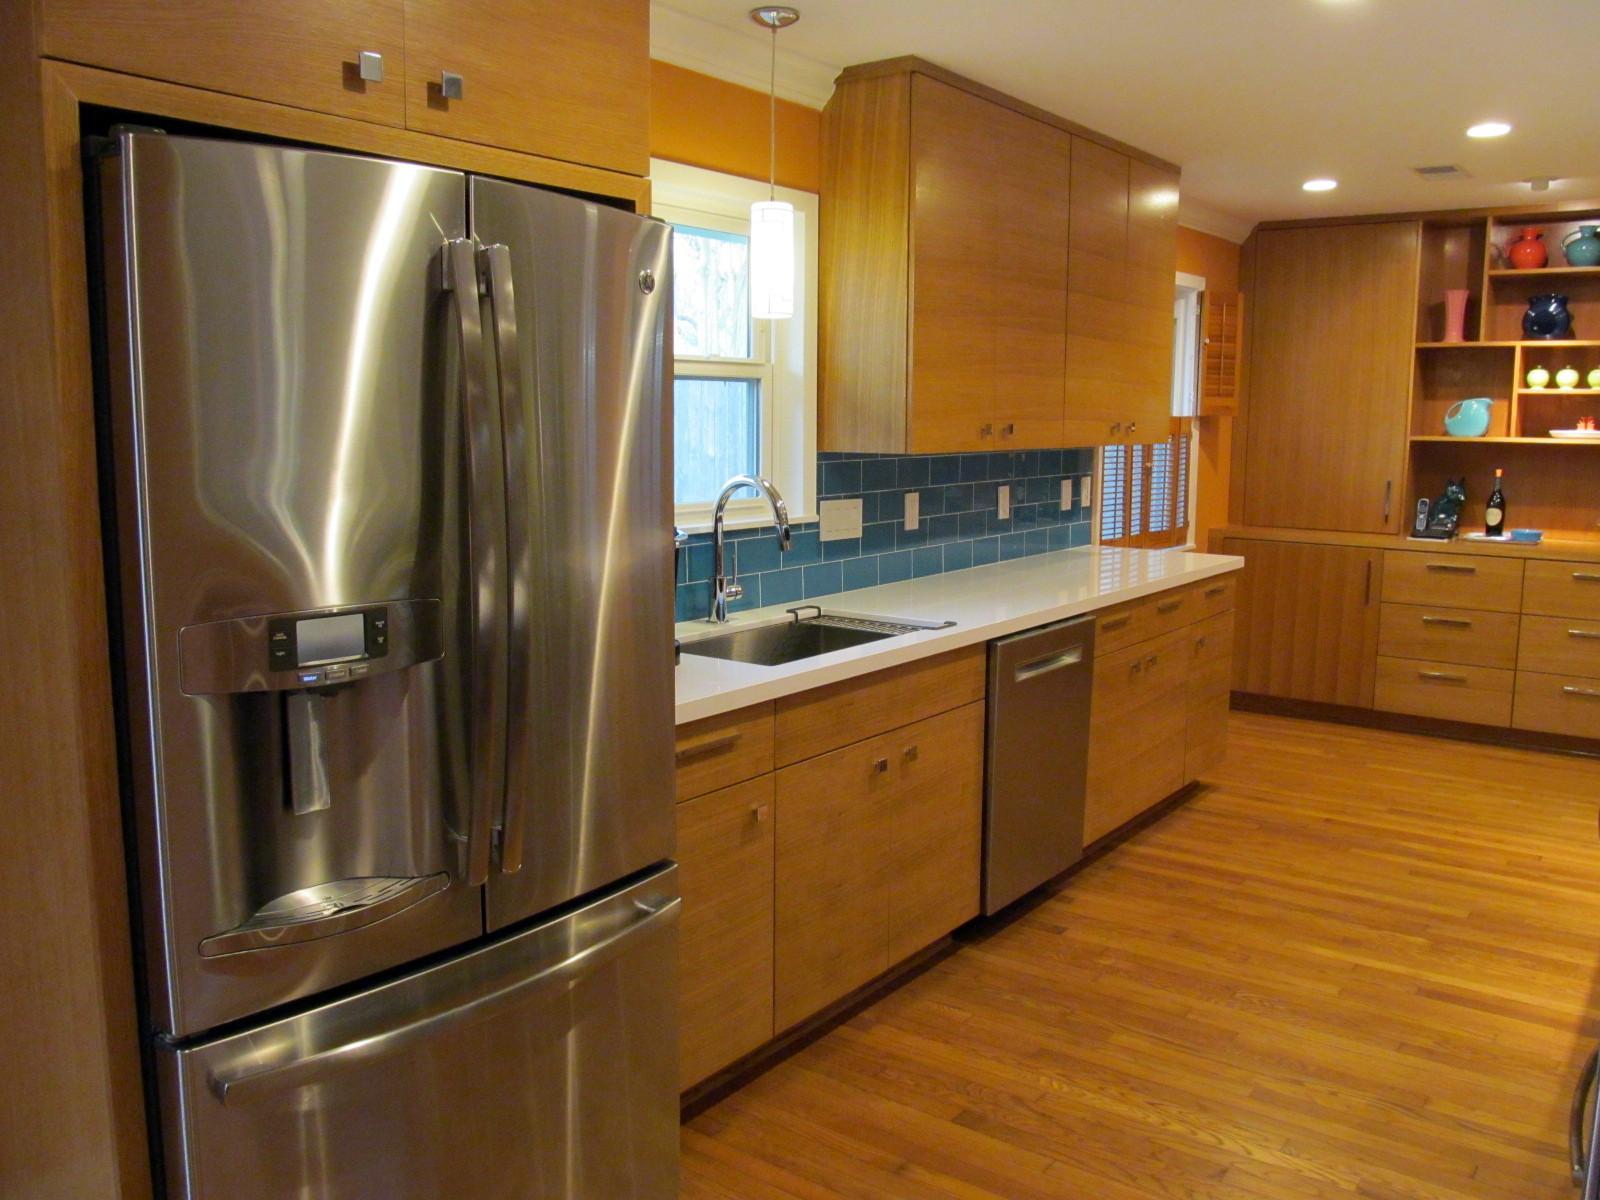 Mid Mod Kitchen - love the new look!.JPG